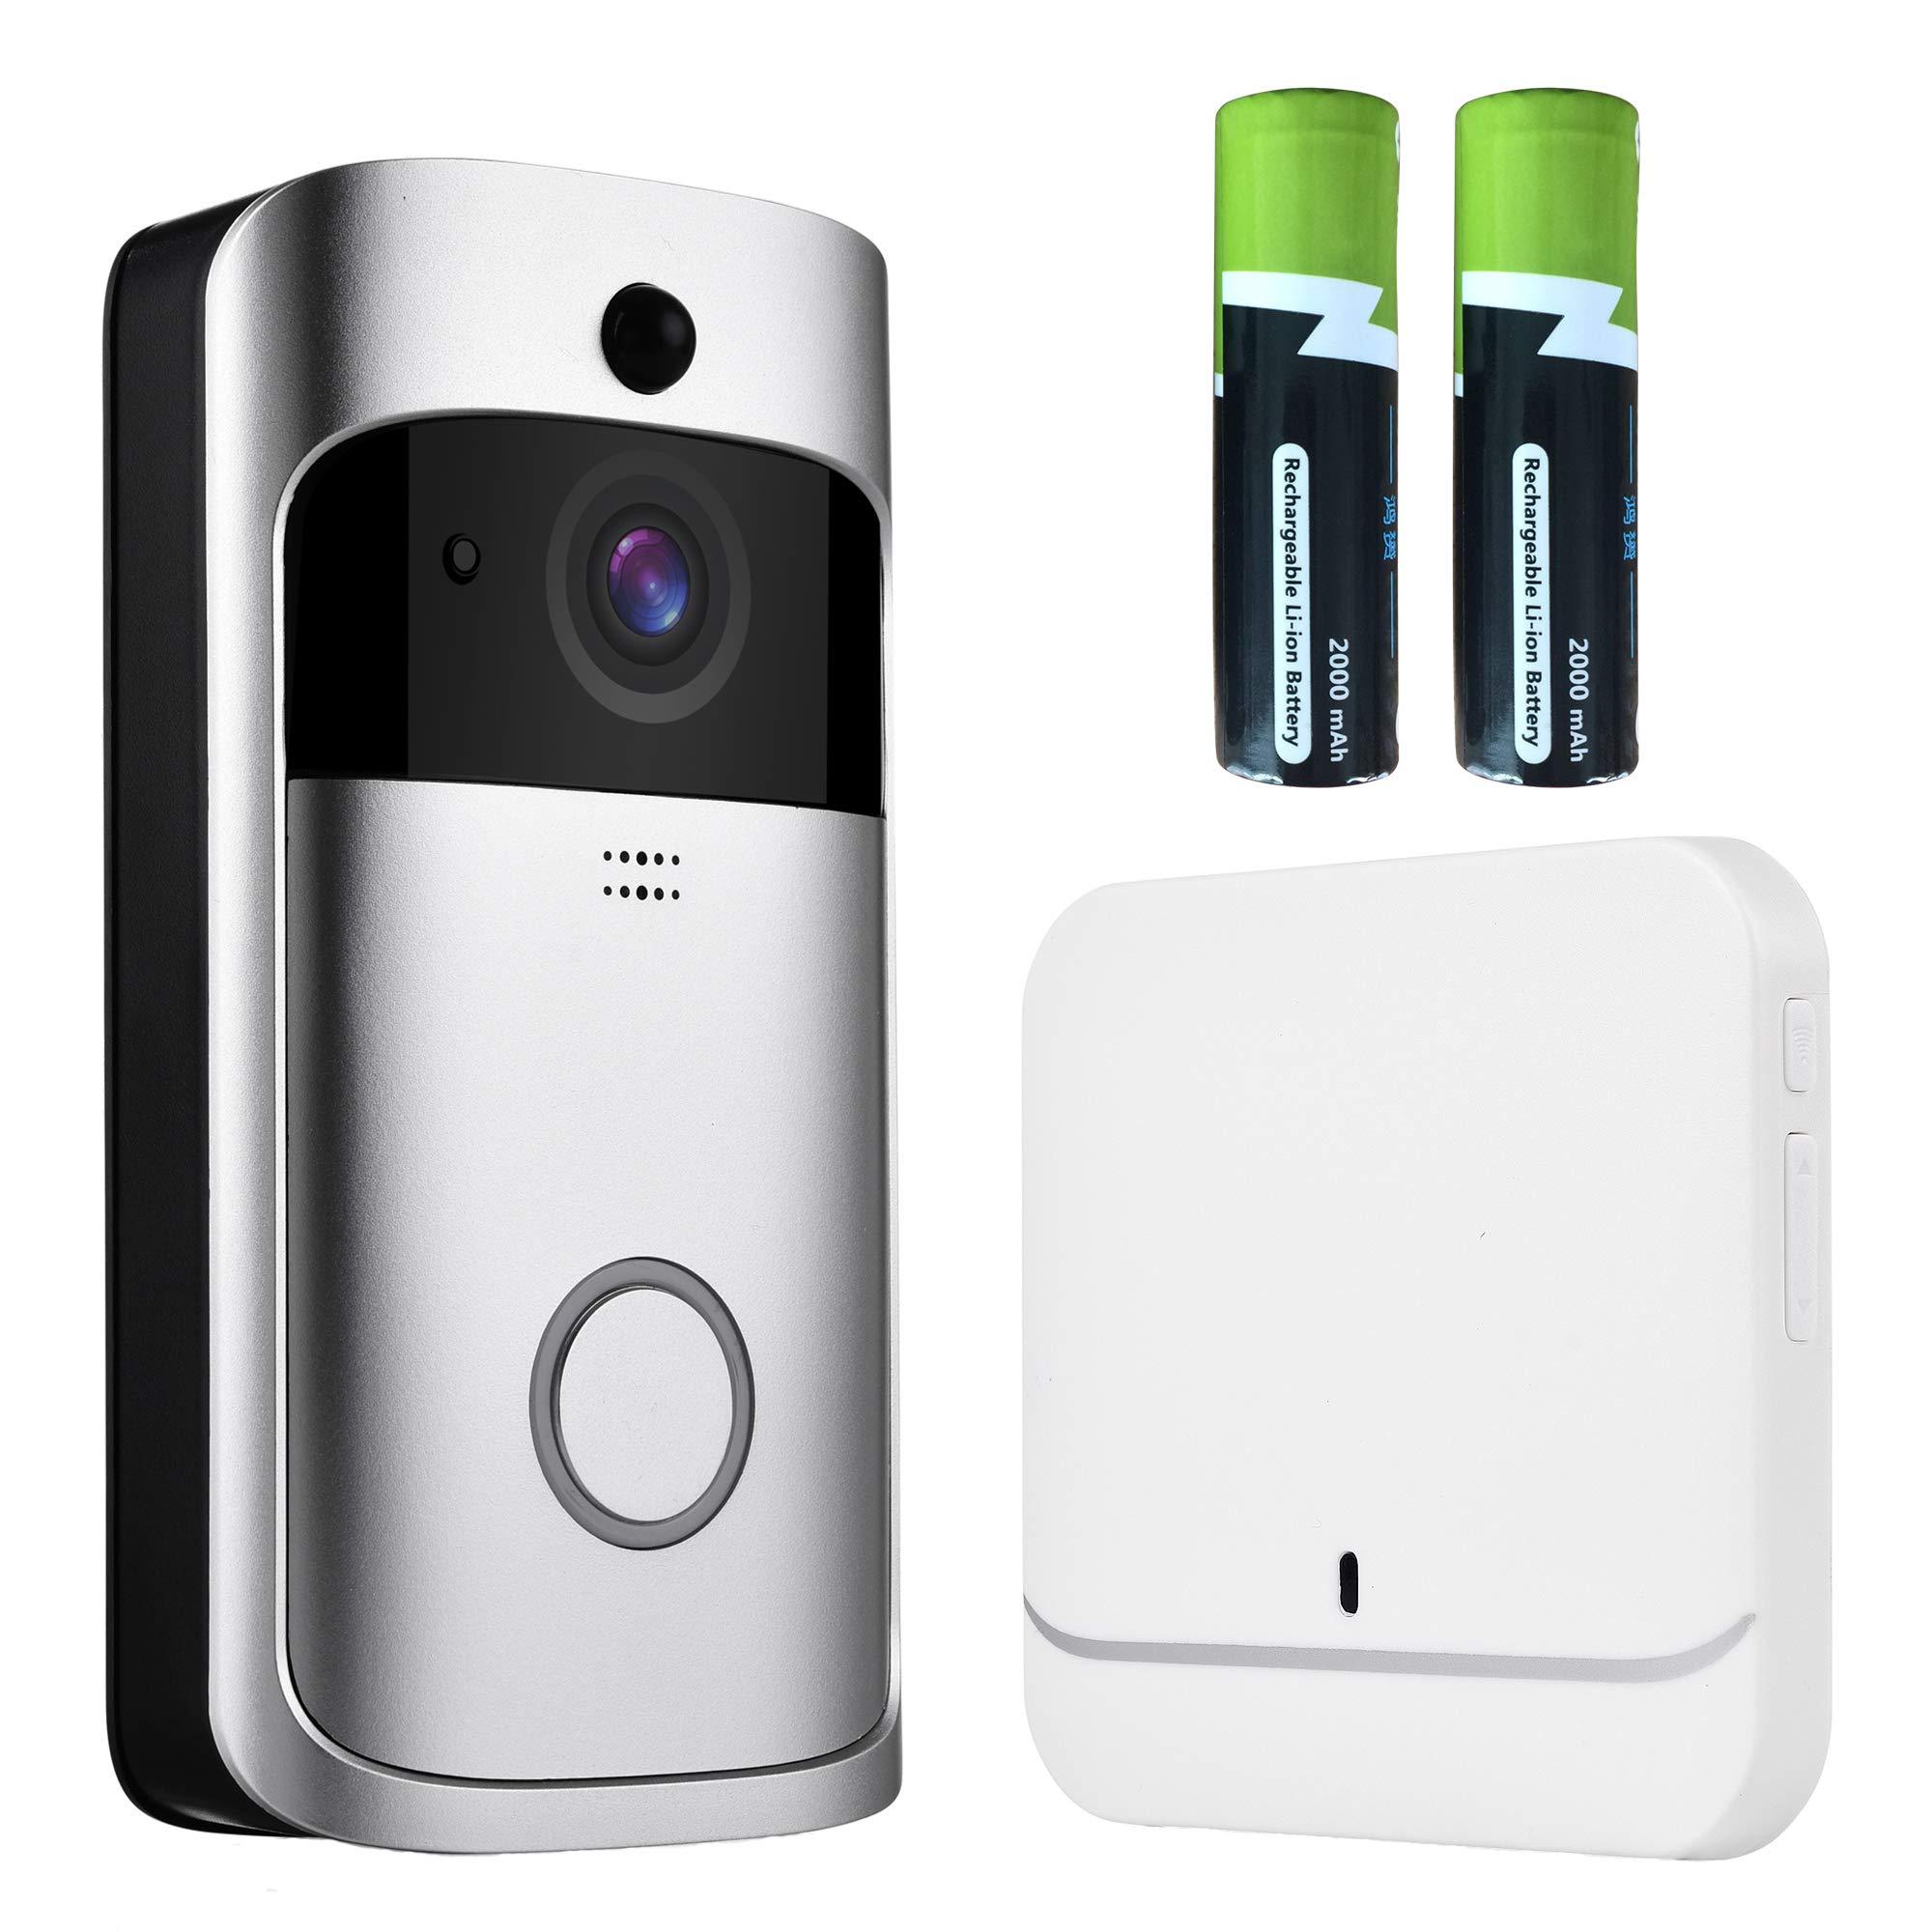 Video Doorbell- OnLyee WiFi 1080P Full HD Real-time Smart Doorbell with IP 65 Waterproof, PIR Montion Detection, Free Cloud Storage, Two-Way Audio and 433Mhz Doorbell Chime (1080P Silver)